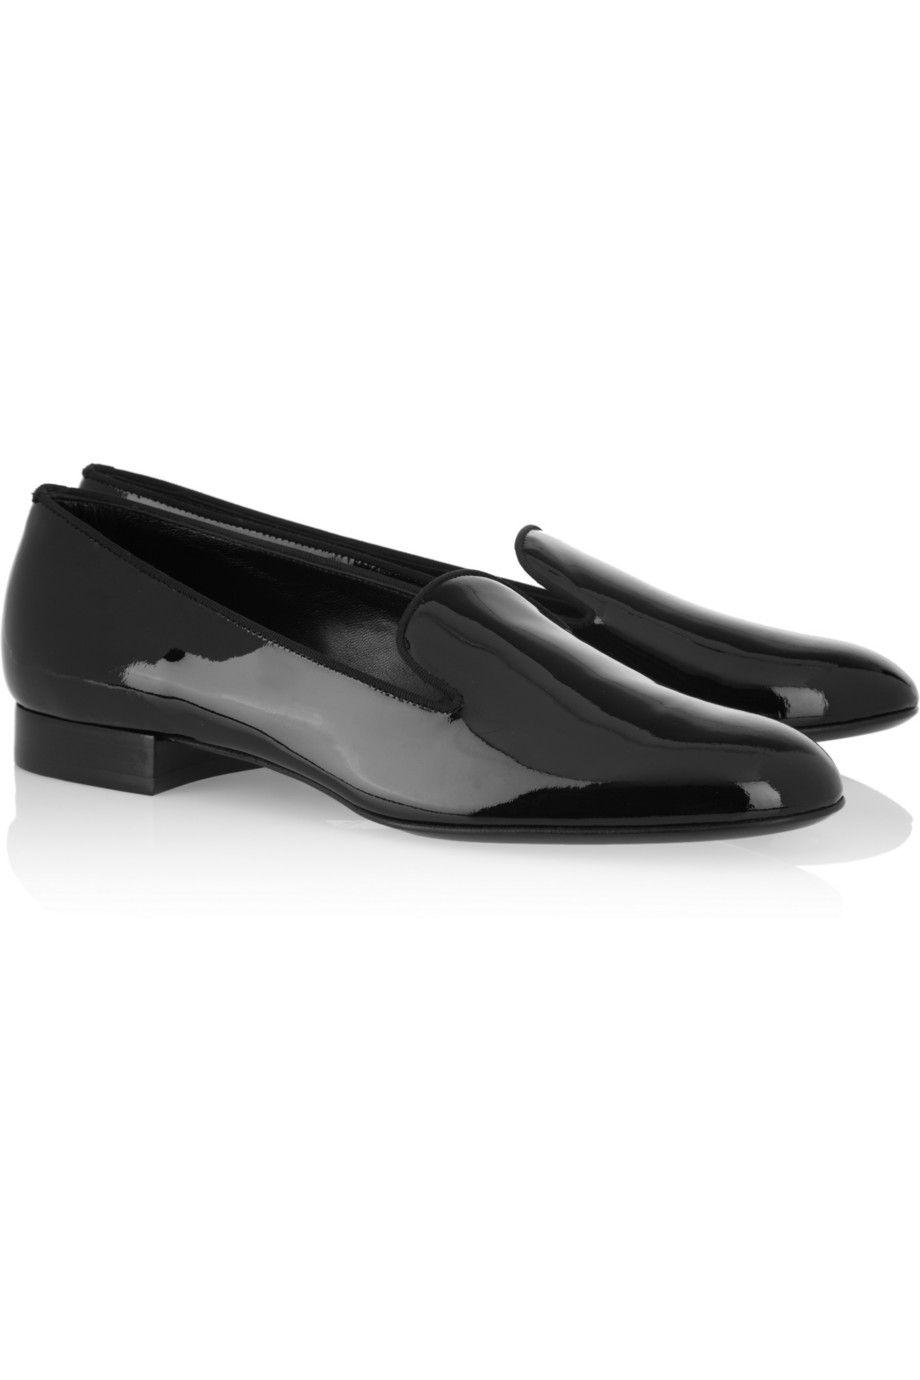 Saint Laurent | Patent-leather slippers